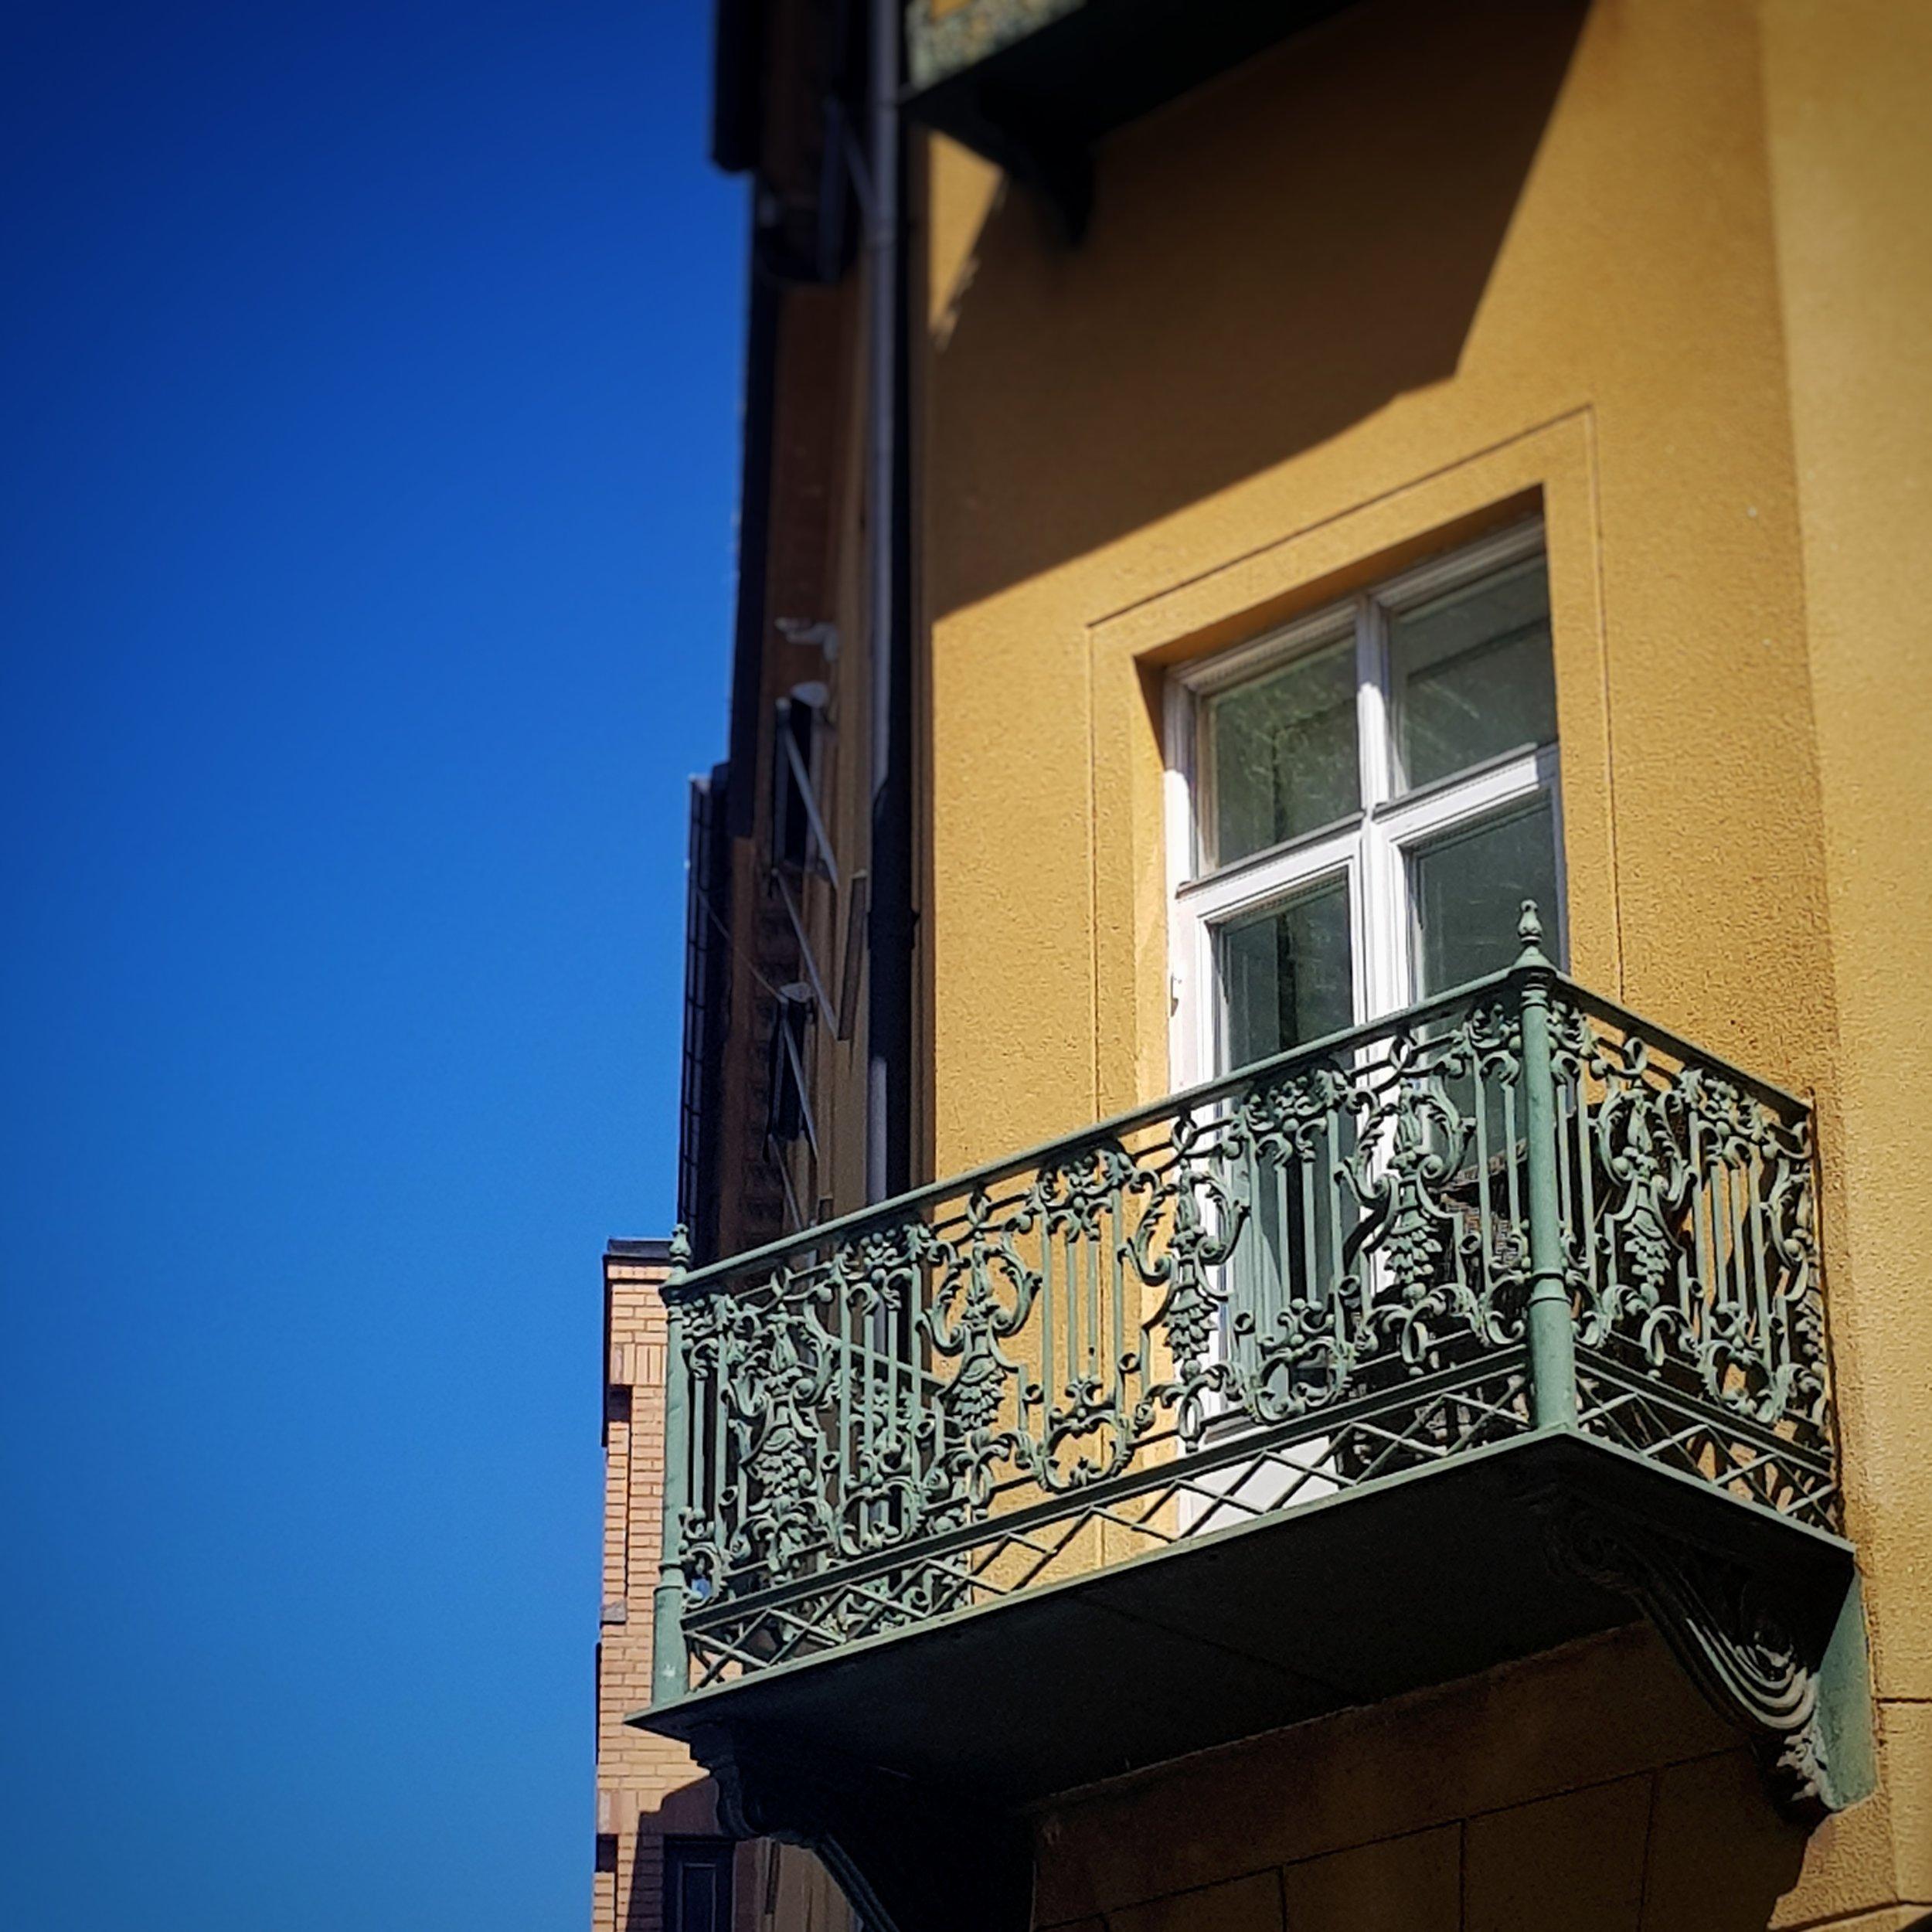 Day 186 - July 5: Balcony